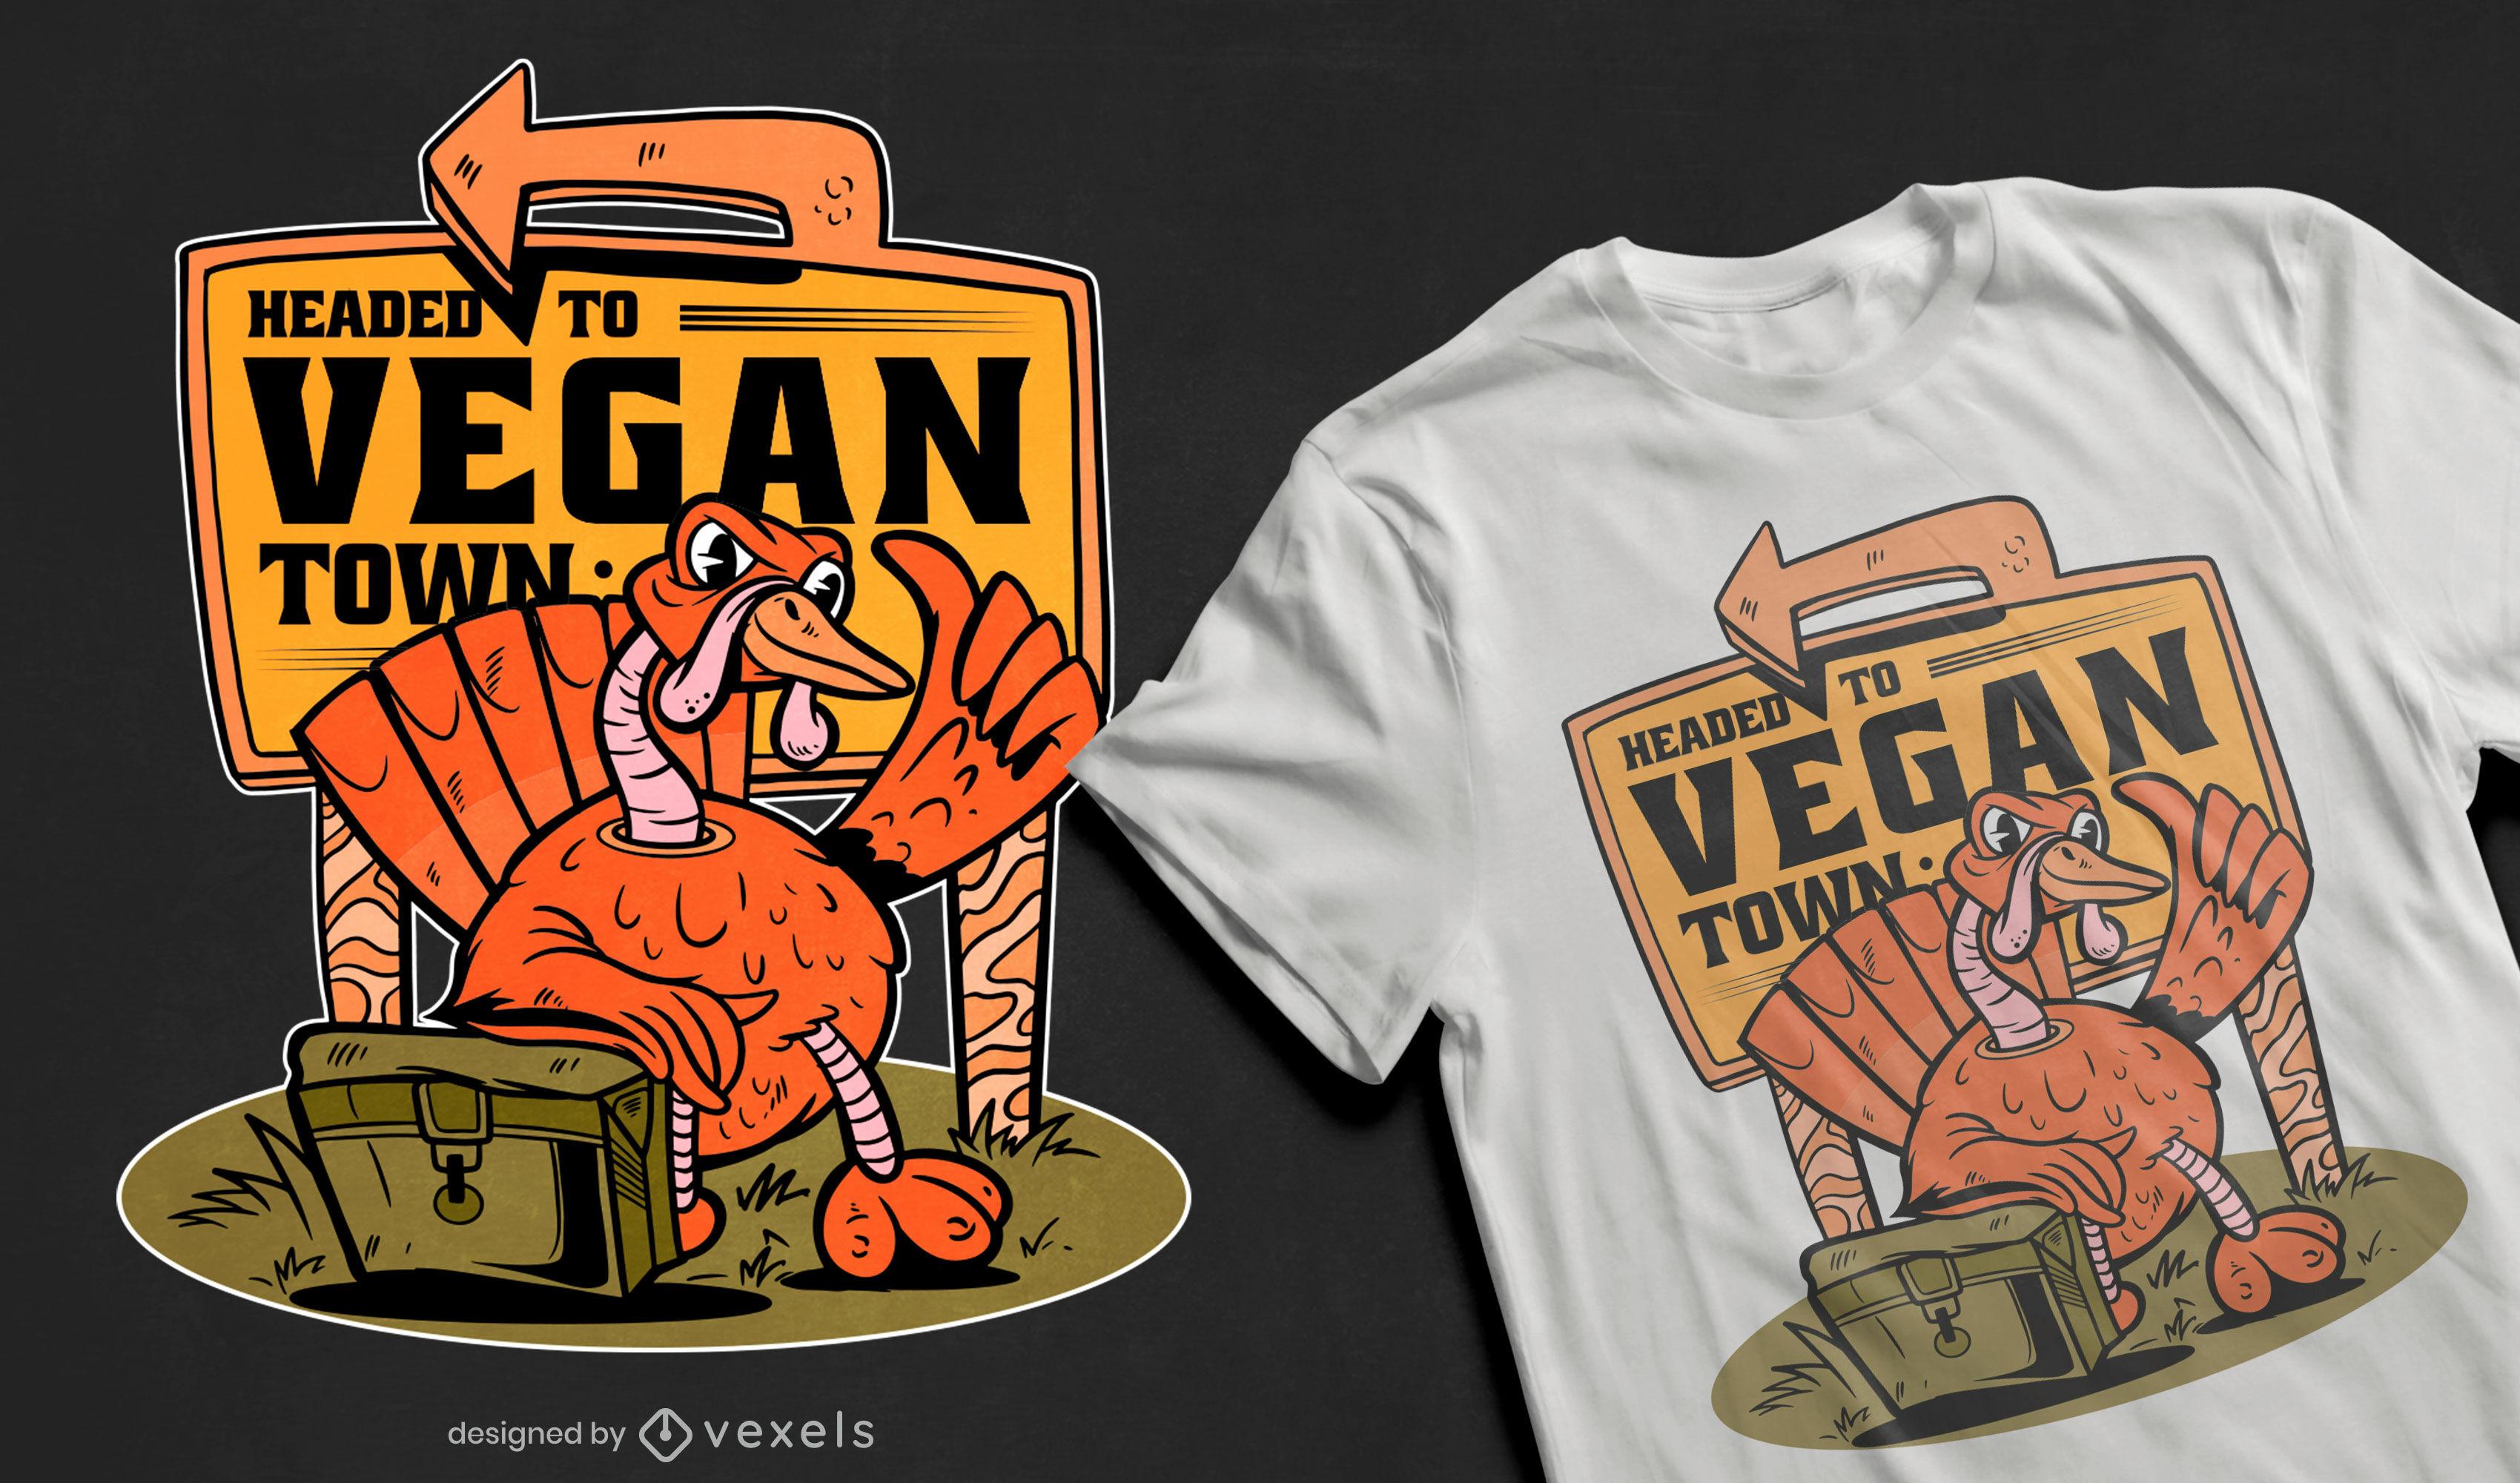 Dise?o de camiseta vegana